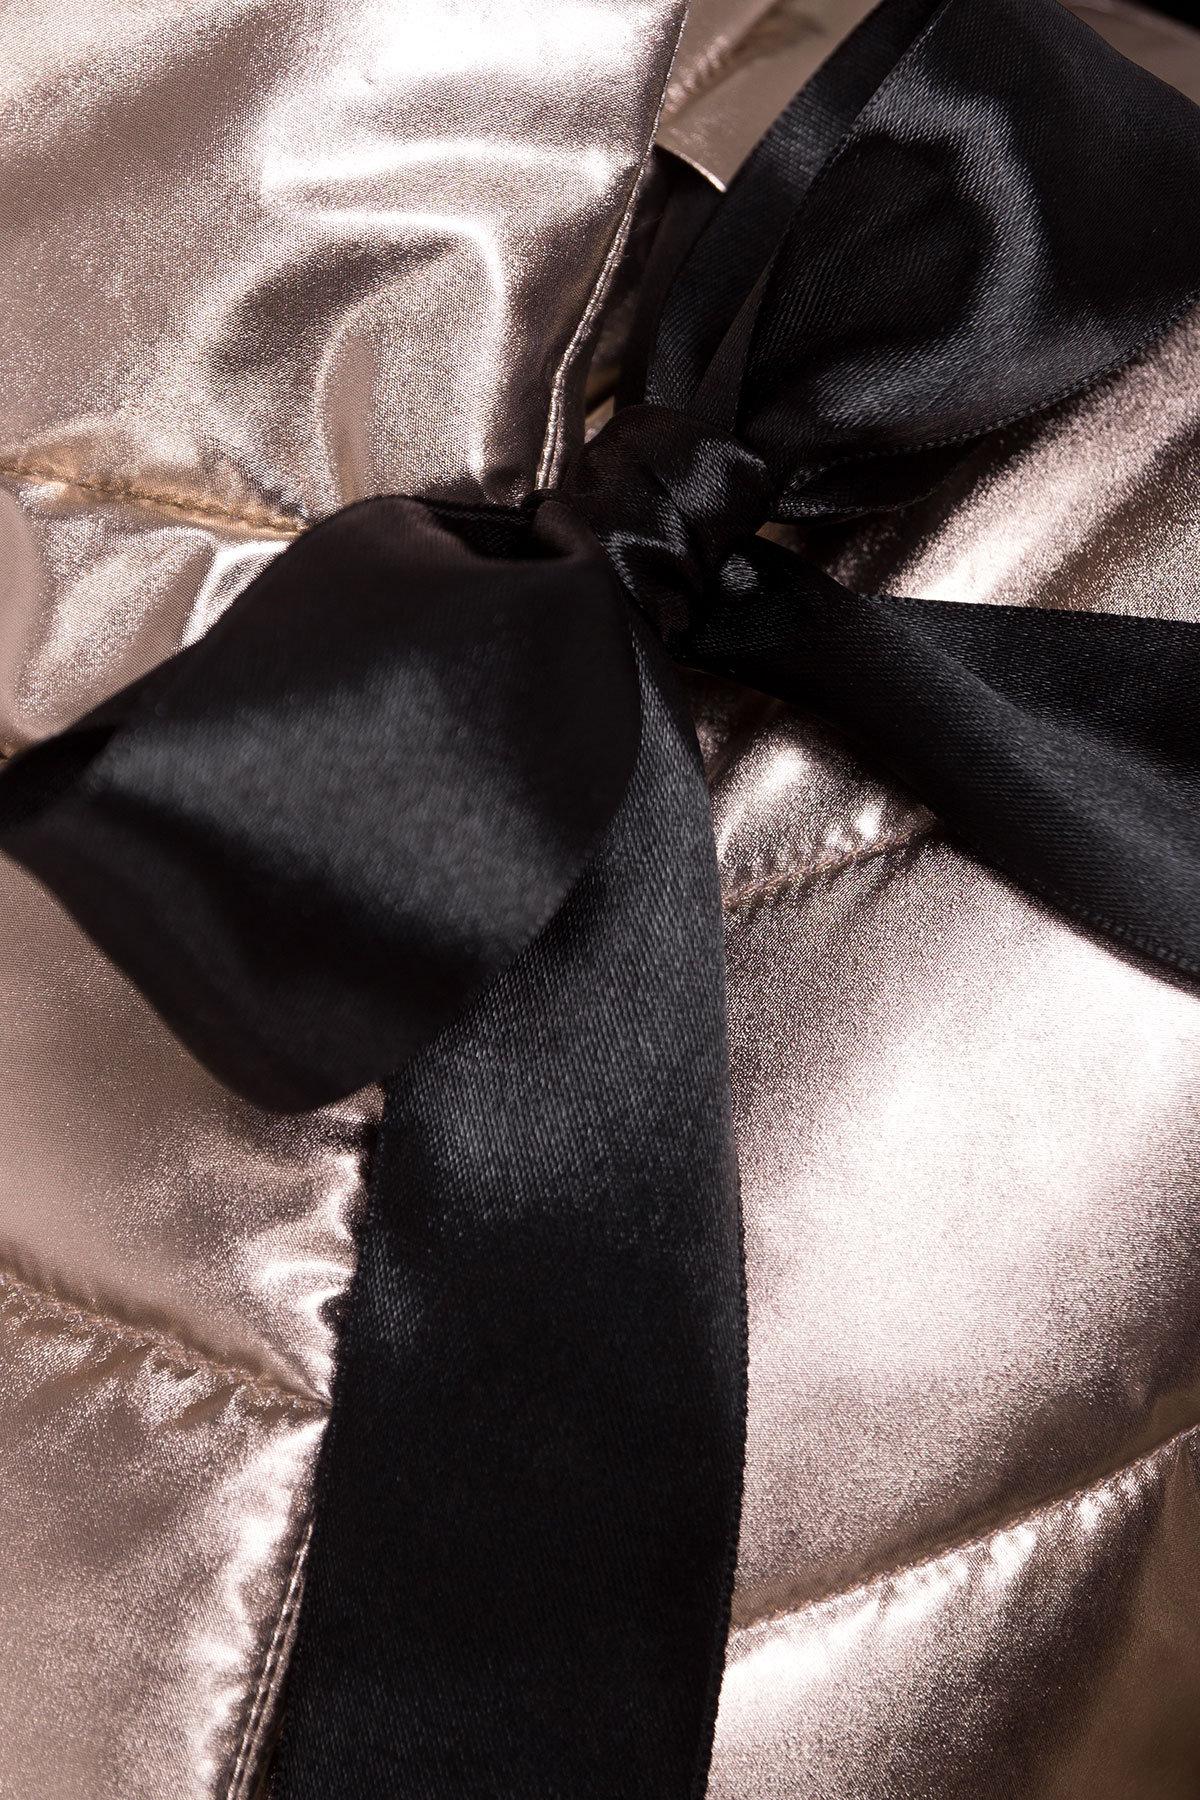 Куртка металлик Эллария 4589 АРТ. 21749 Цвет: Золото - фото 3, интернет магазин tm-modus.ru